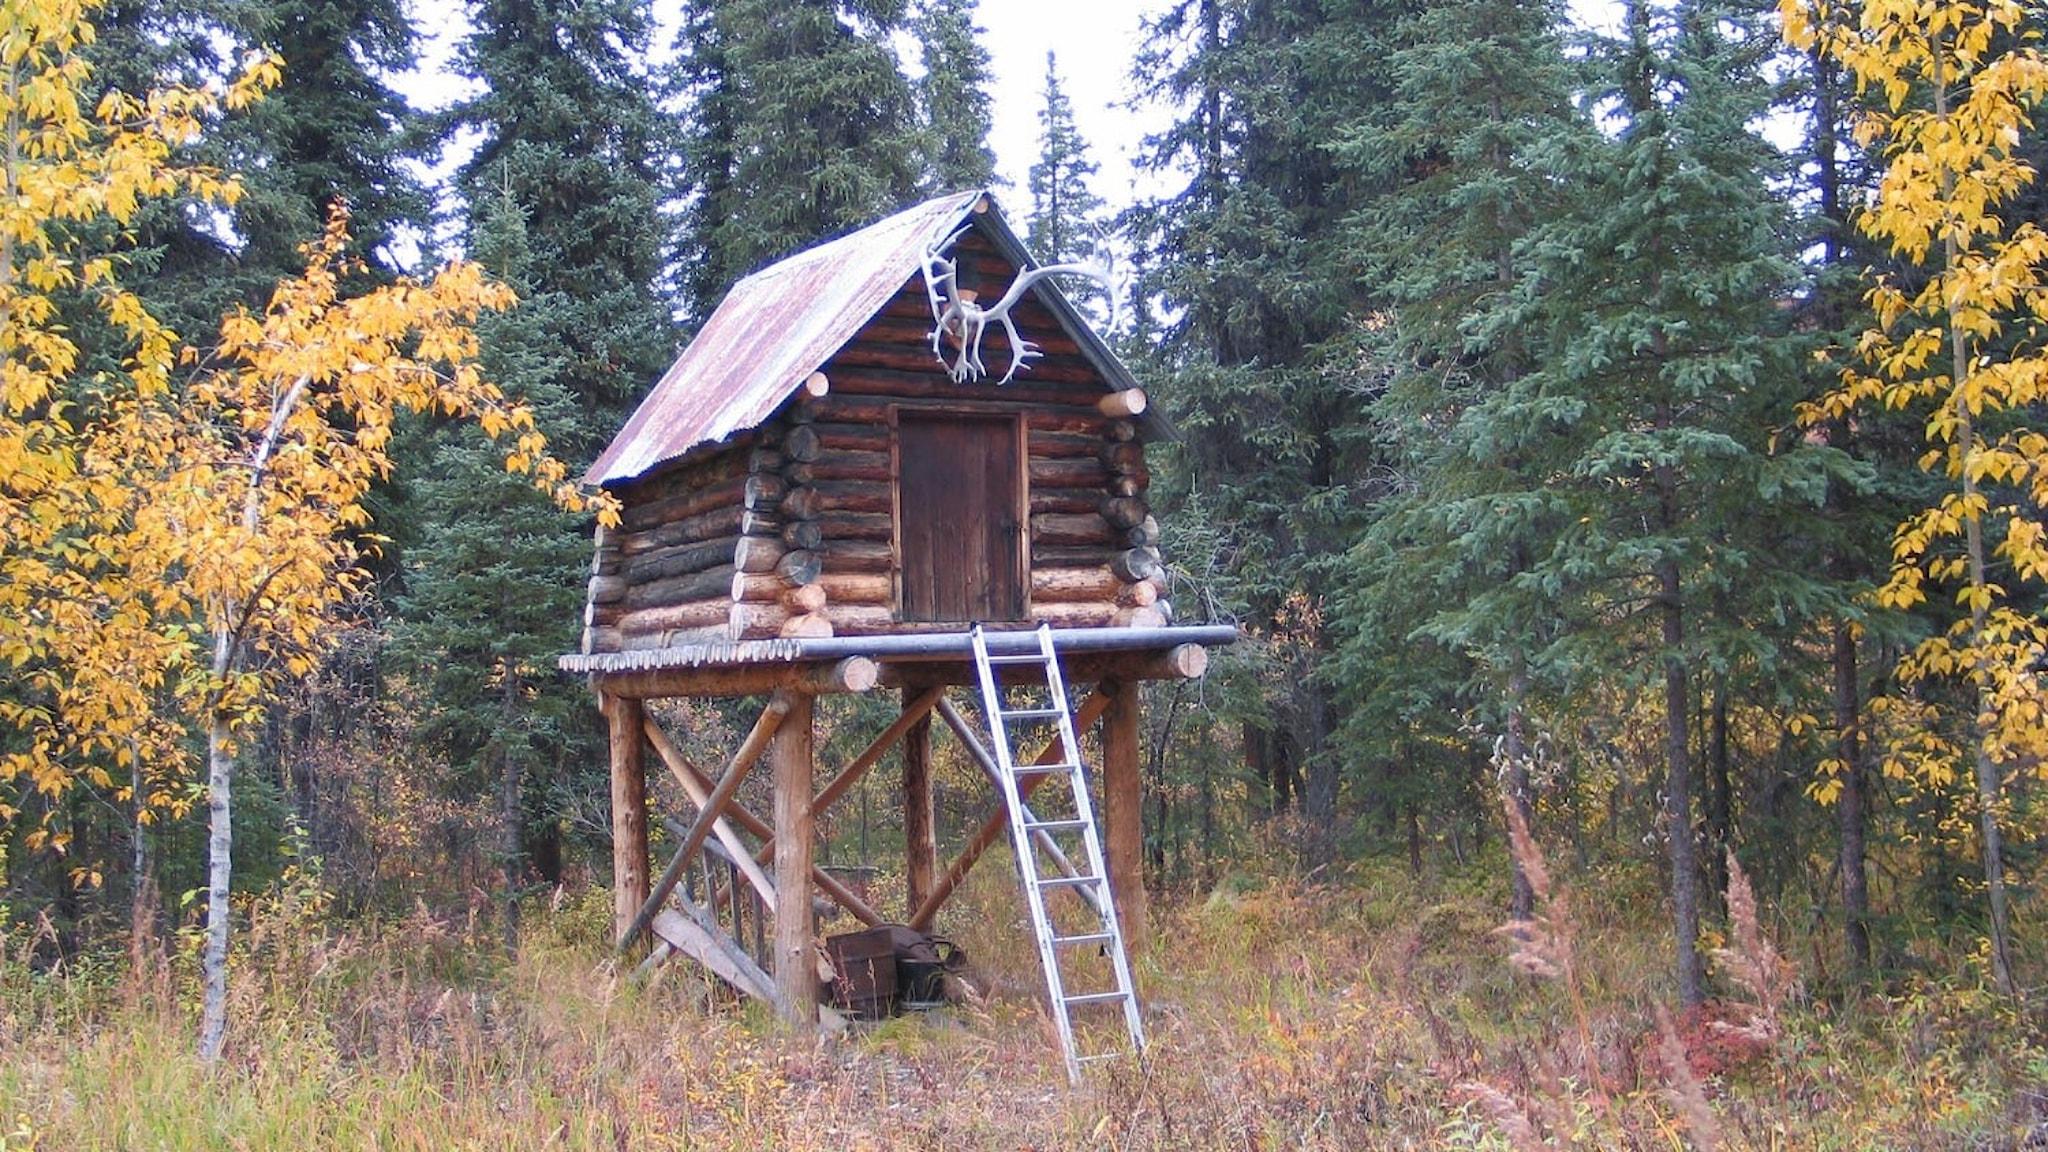 Moose_Creek_Shelter_Cabin_cache